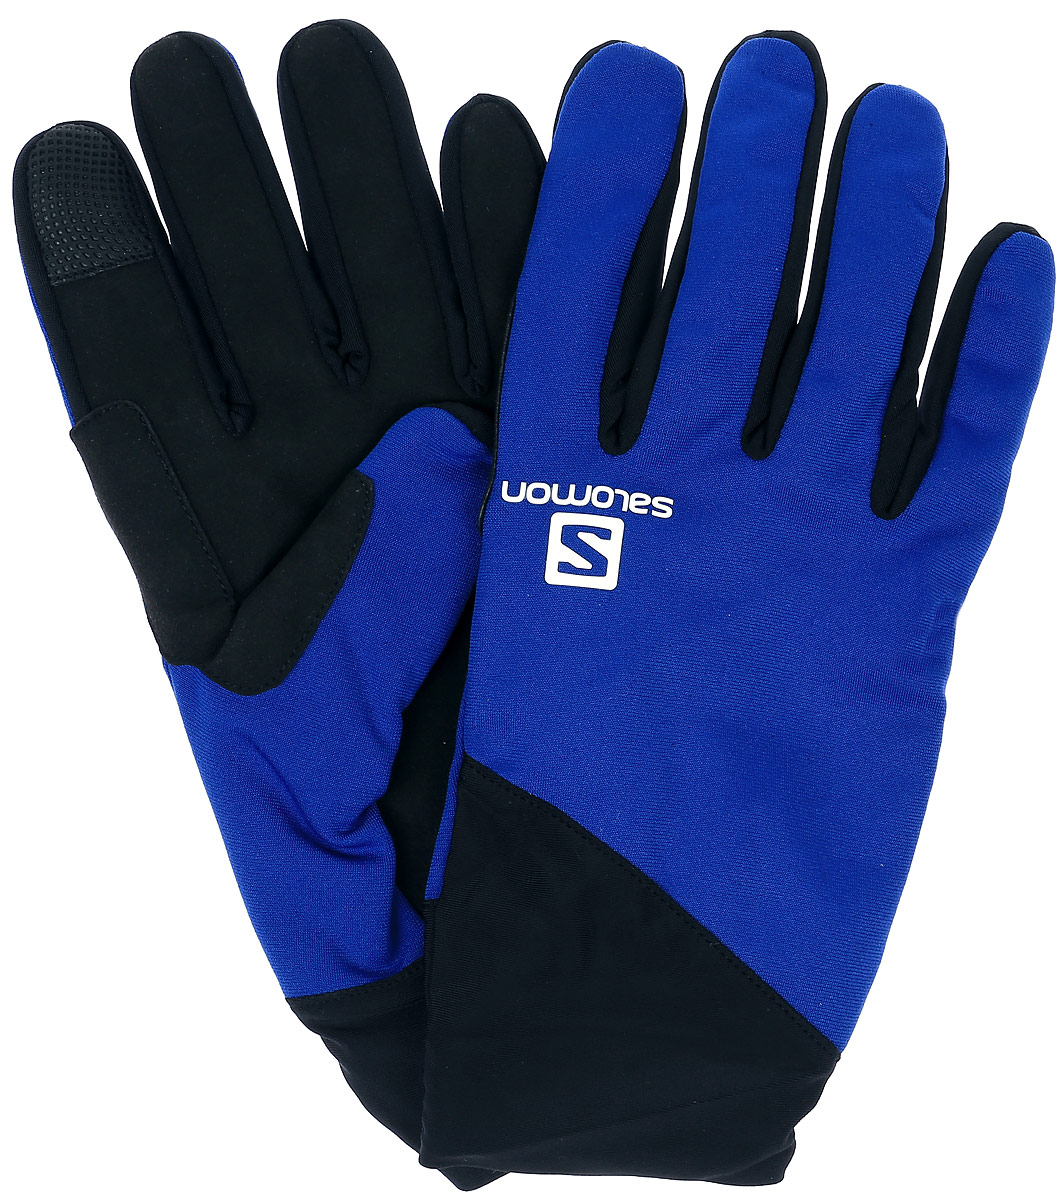 Перчатки мужские Salomon Discovery Glove M, цвет: синий, черный. L39011500. Размер L (9)